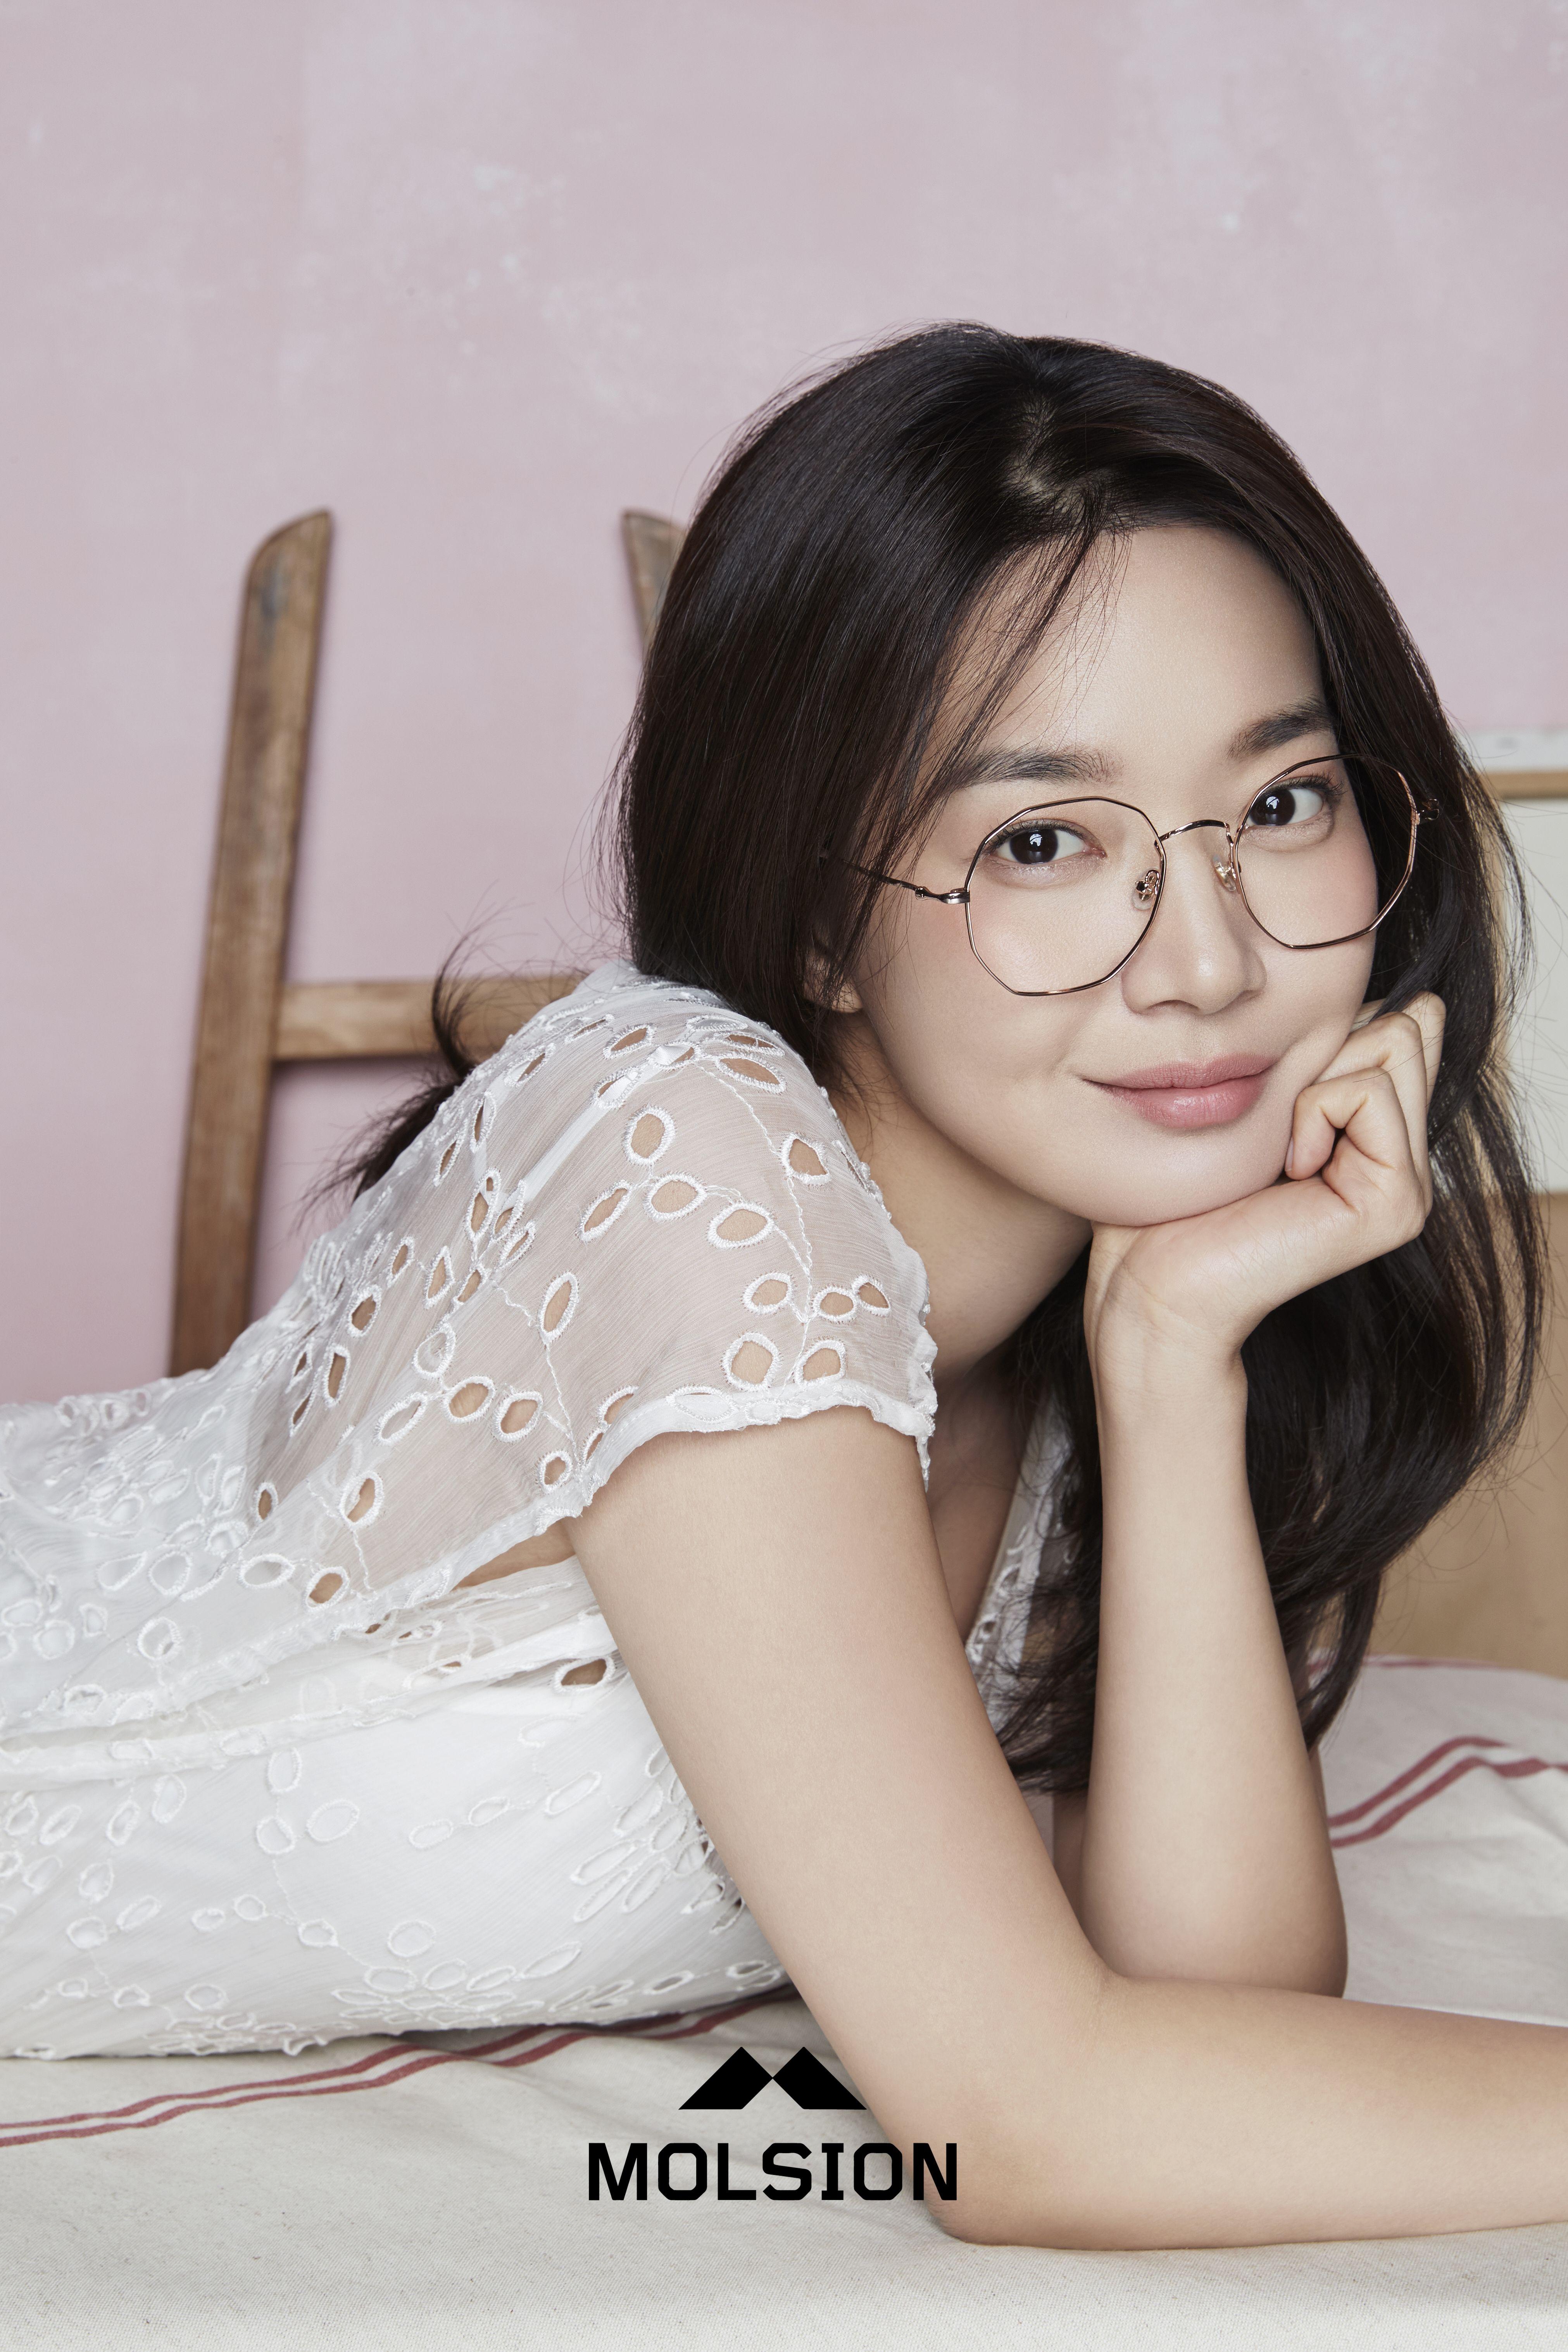 Shin Min Ah | ミナ, シンミナ, アジア